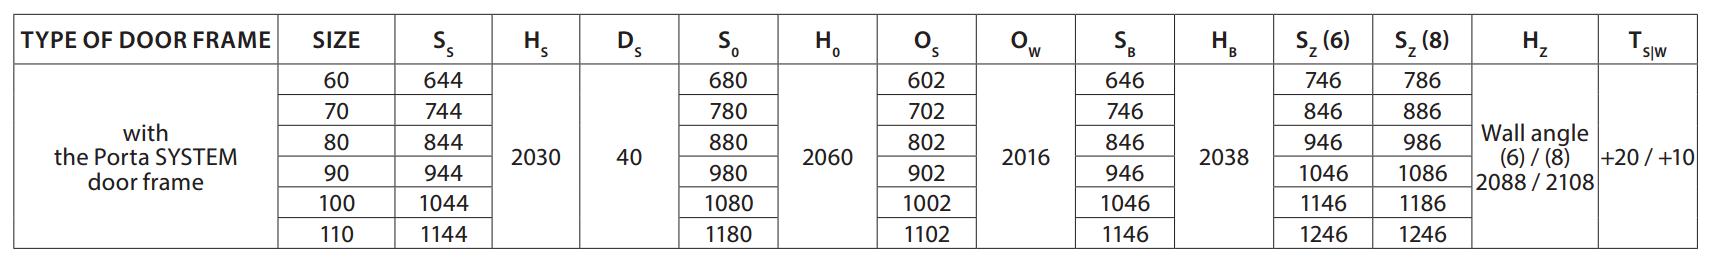 portasystem_size_table